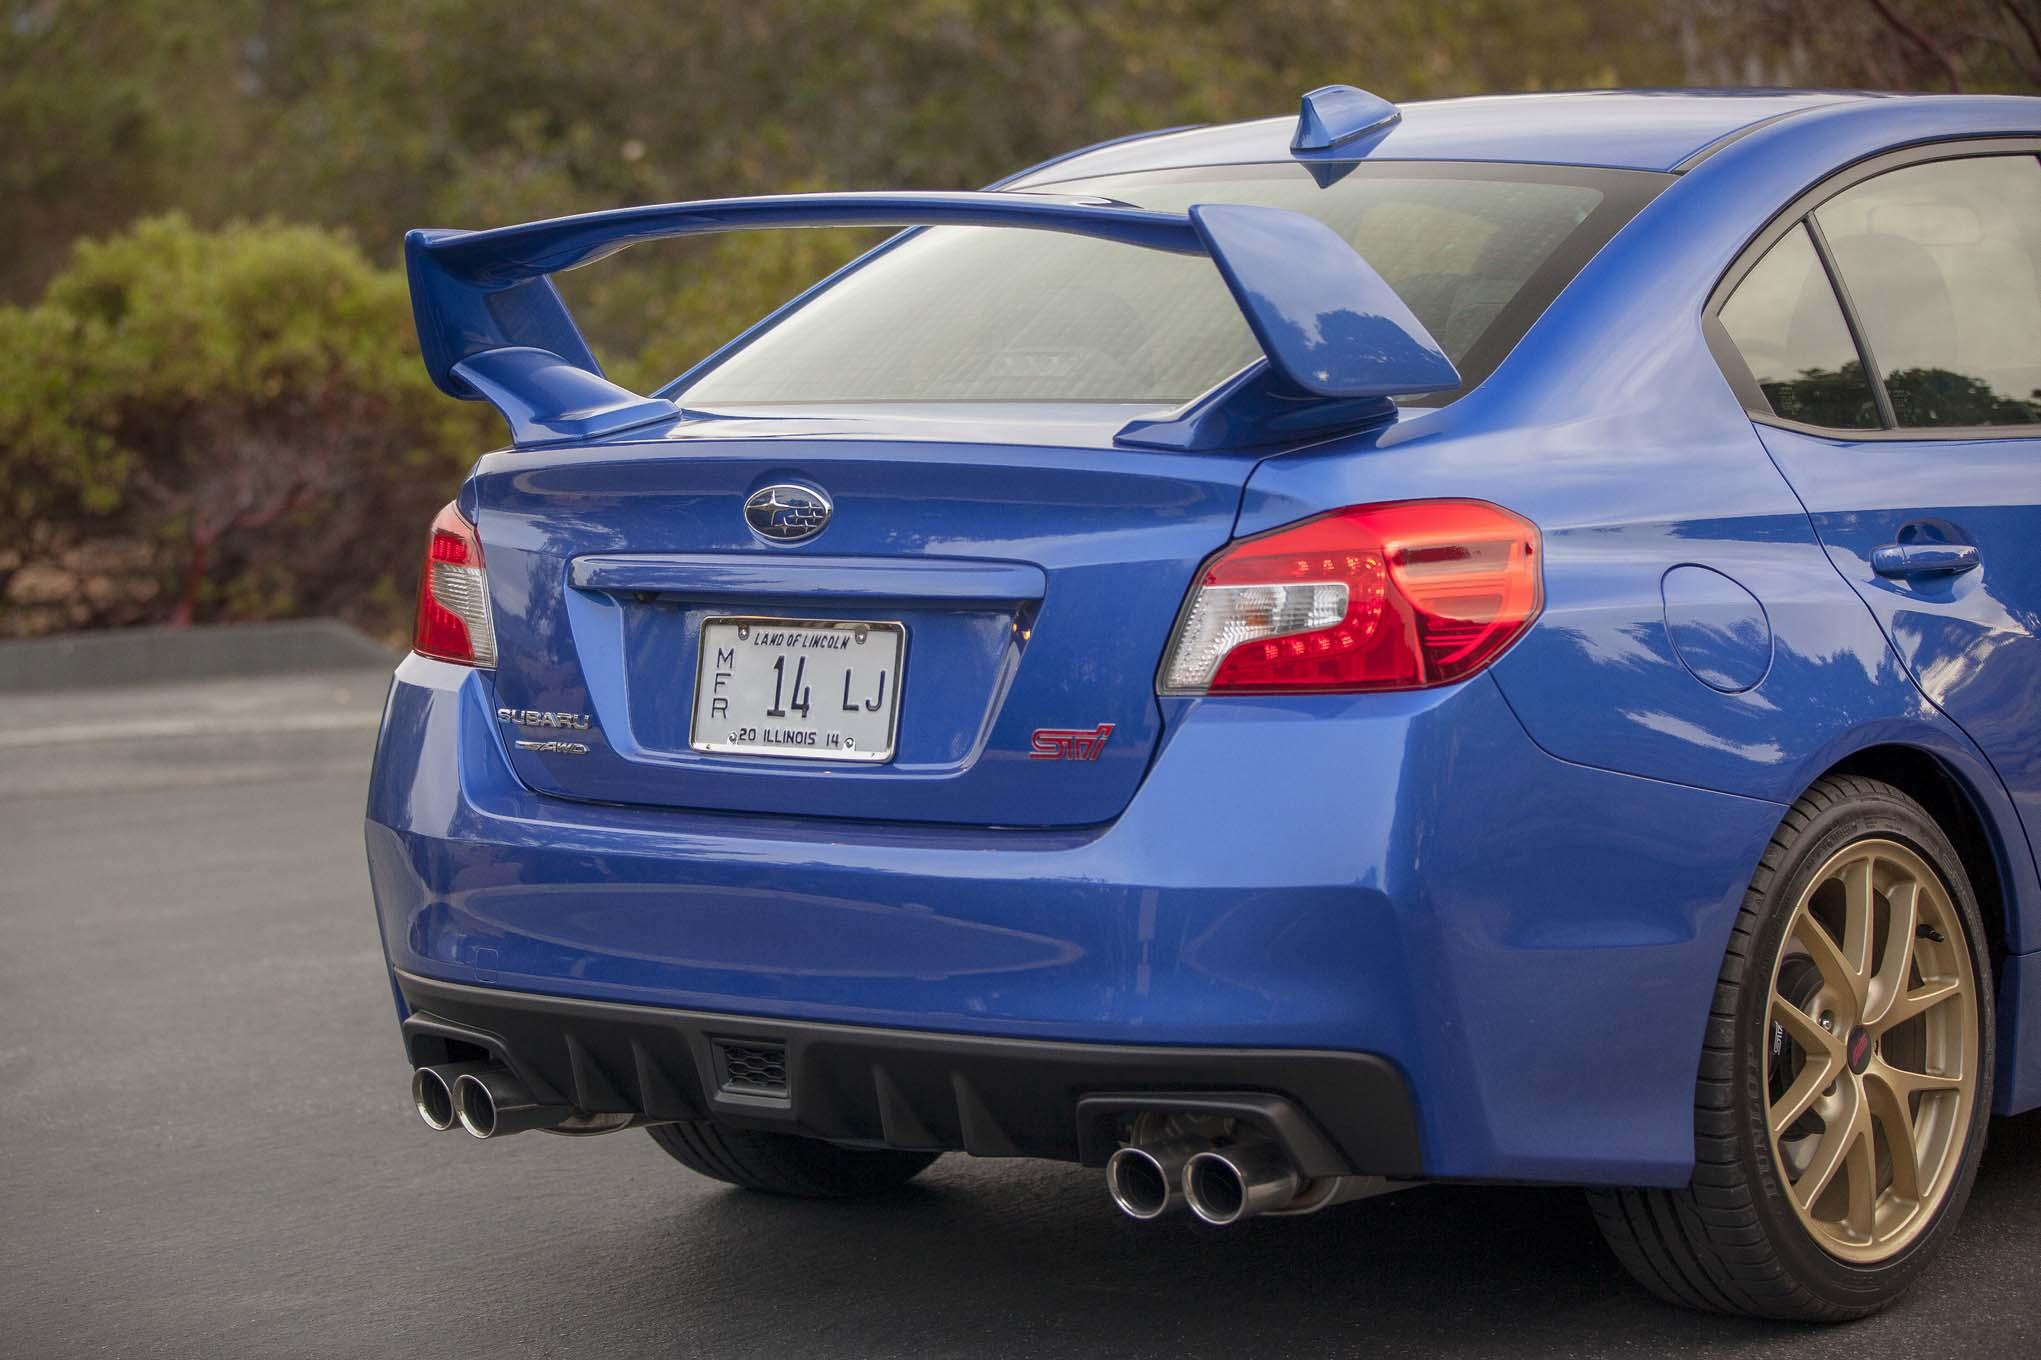 2015 Wrx Sti Launch Edition >> 2015 Subaru WRX STI First Drive - Automobile Magazine